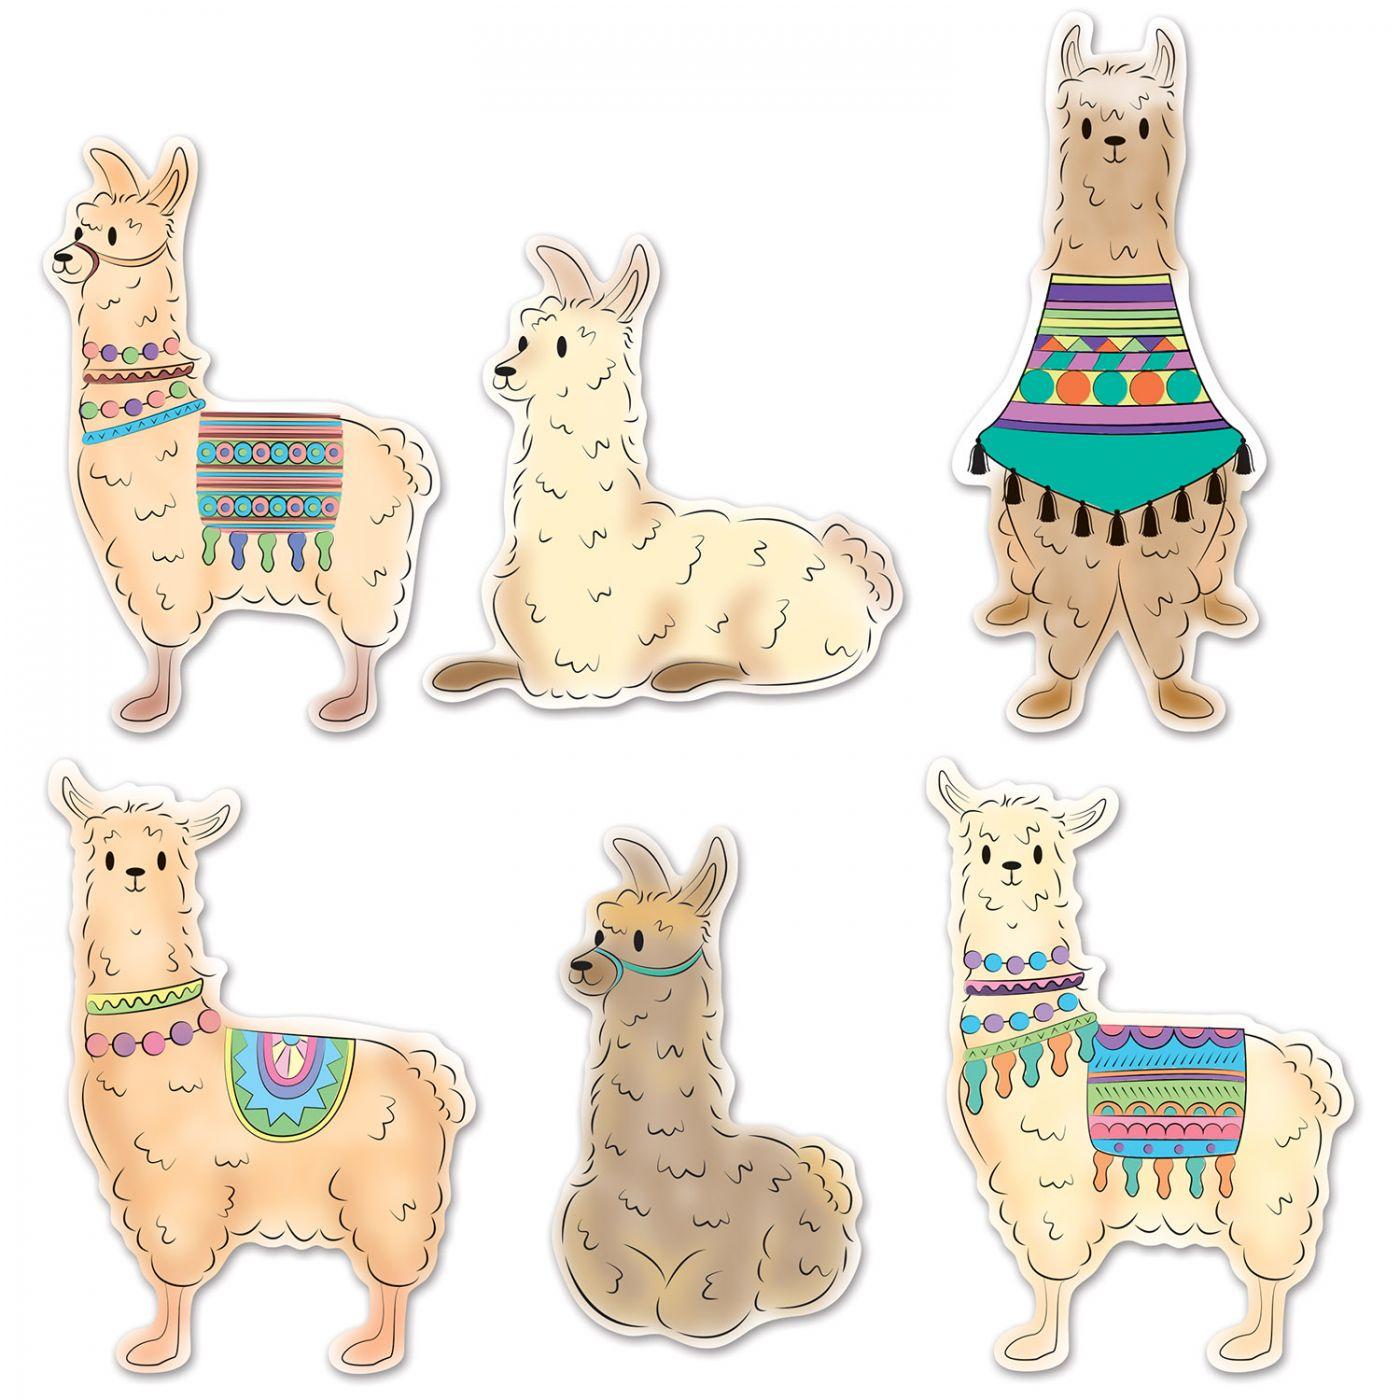 Llama Cutouts image